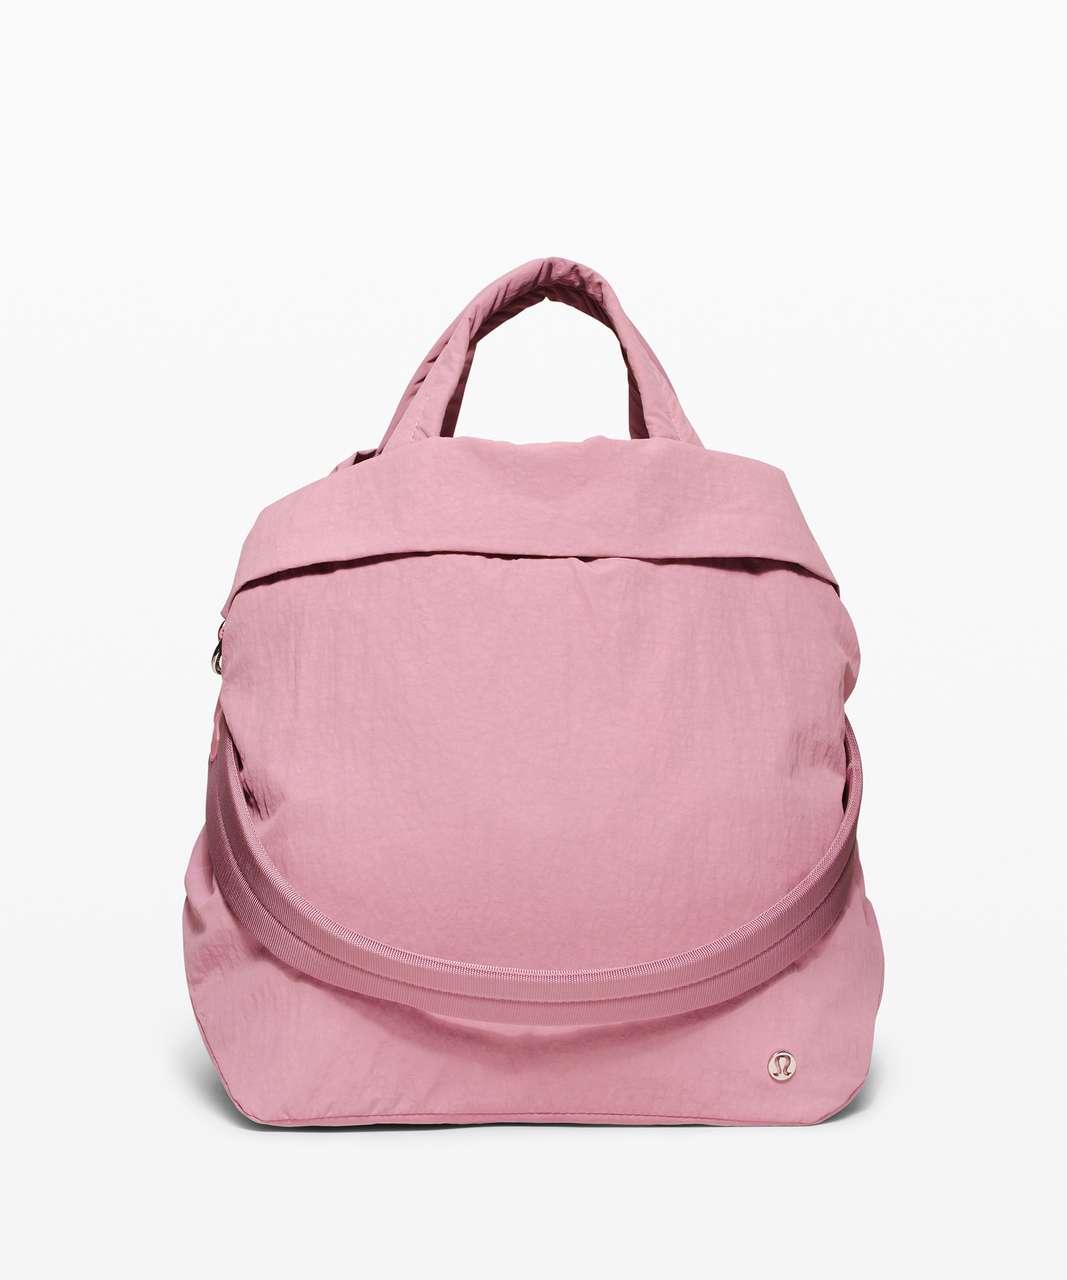 Lululemon On My Level Bag *19L - Pink Taupe